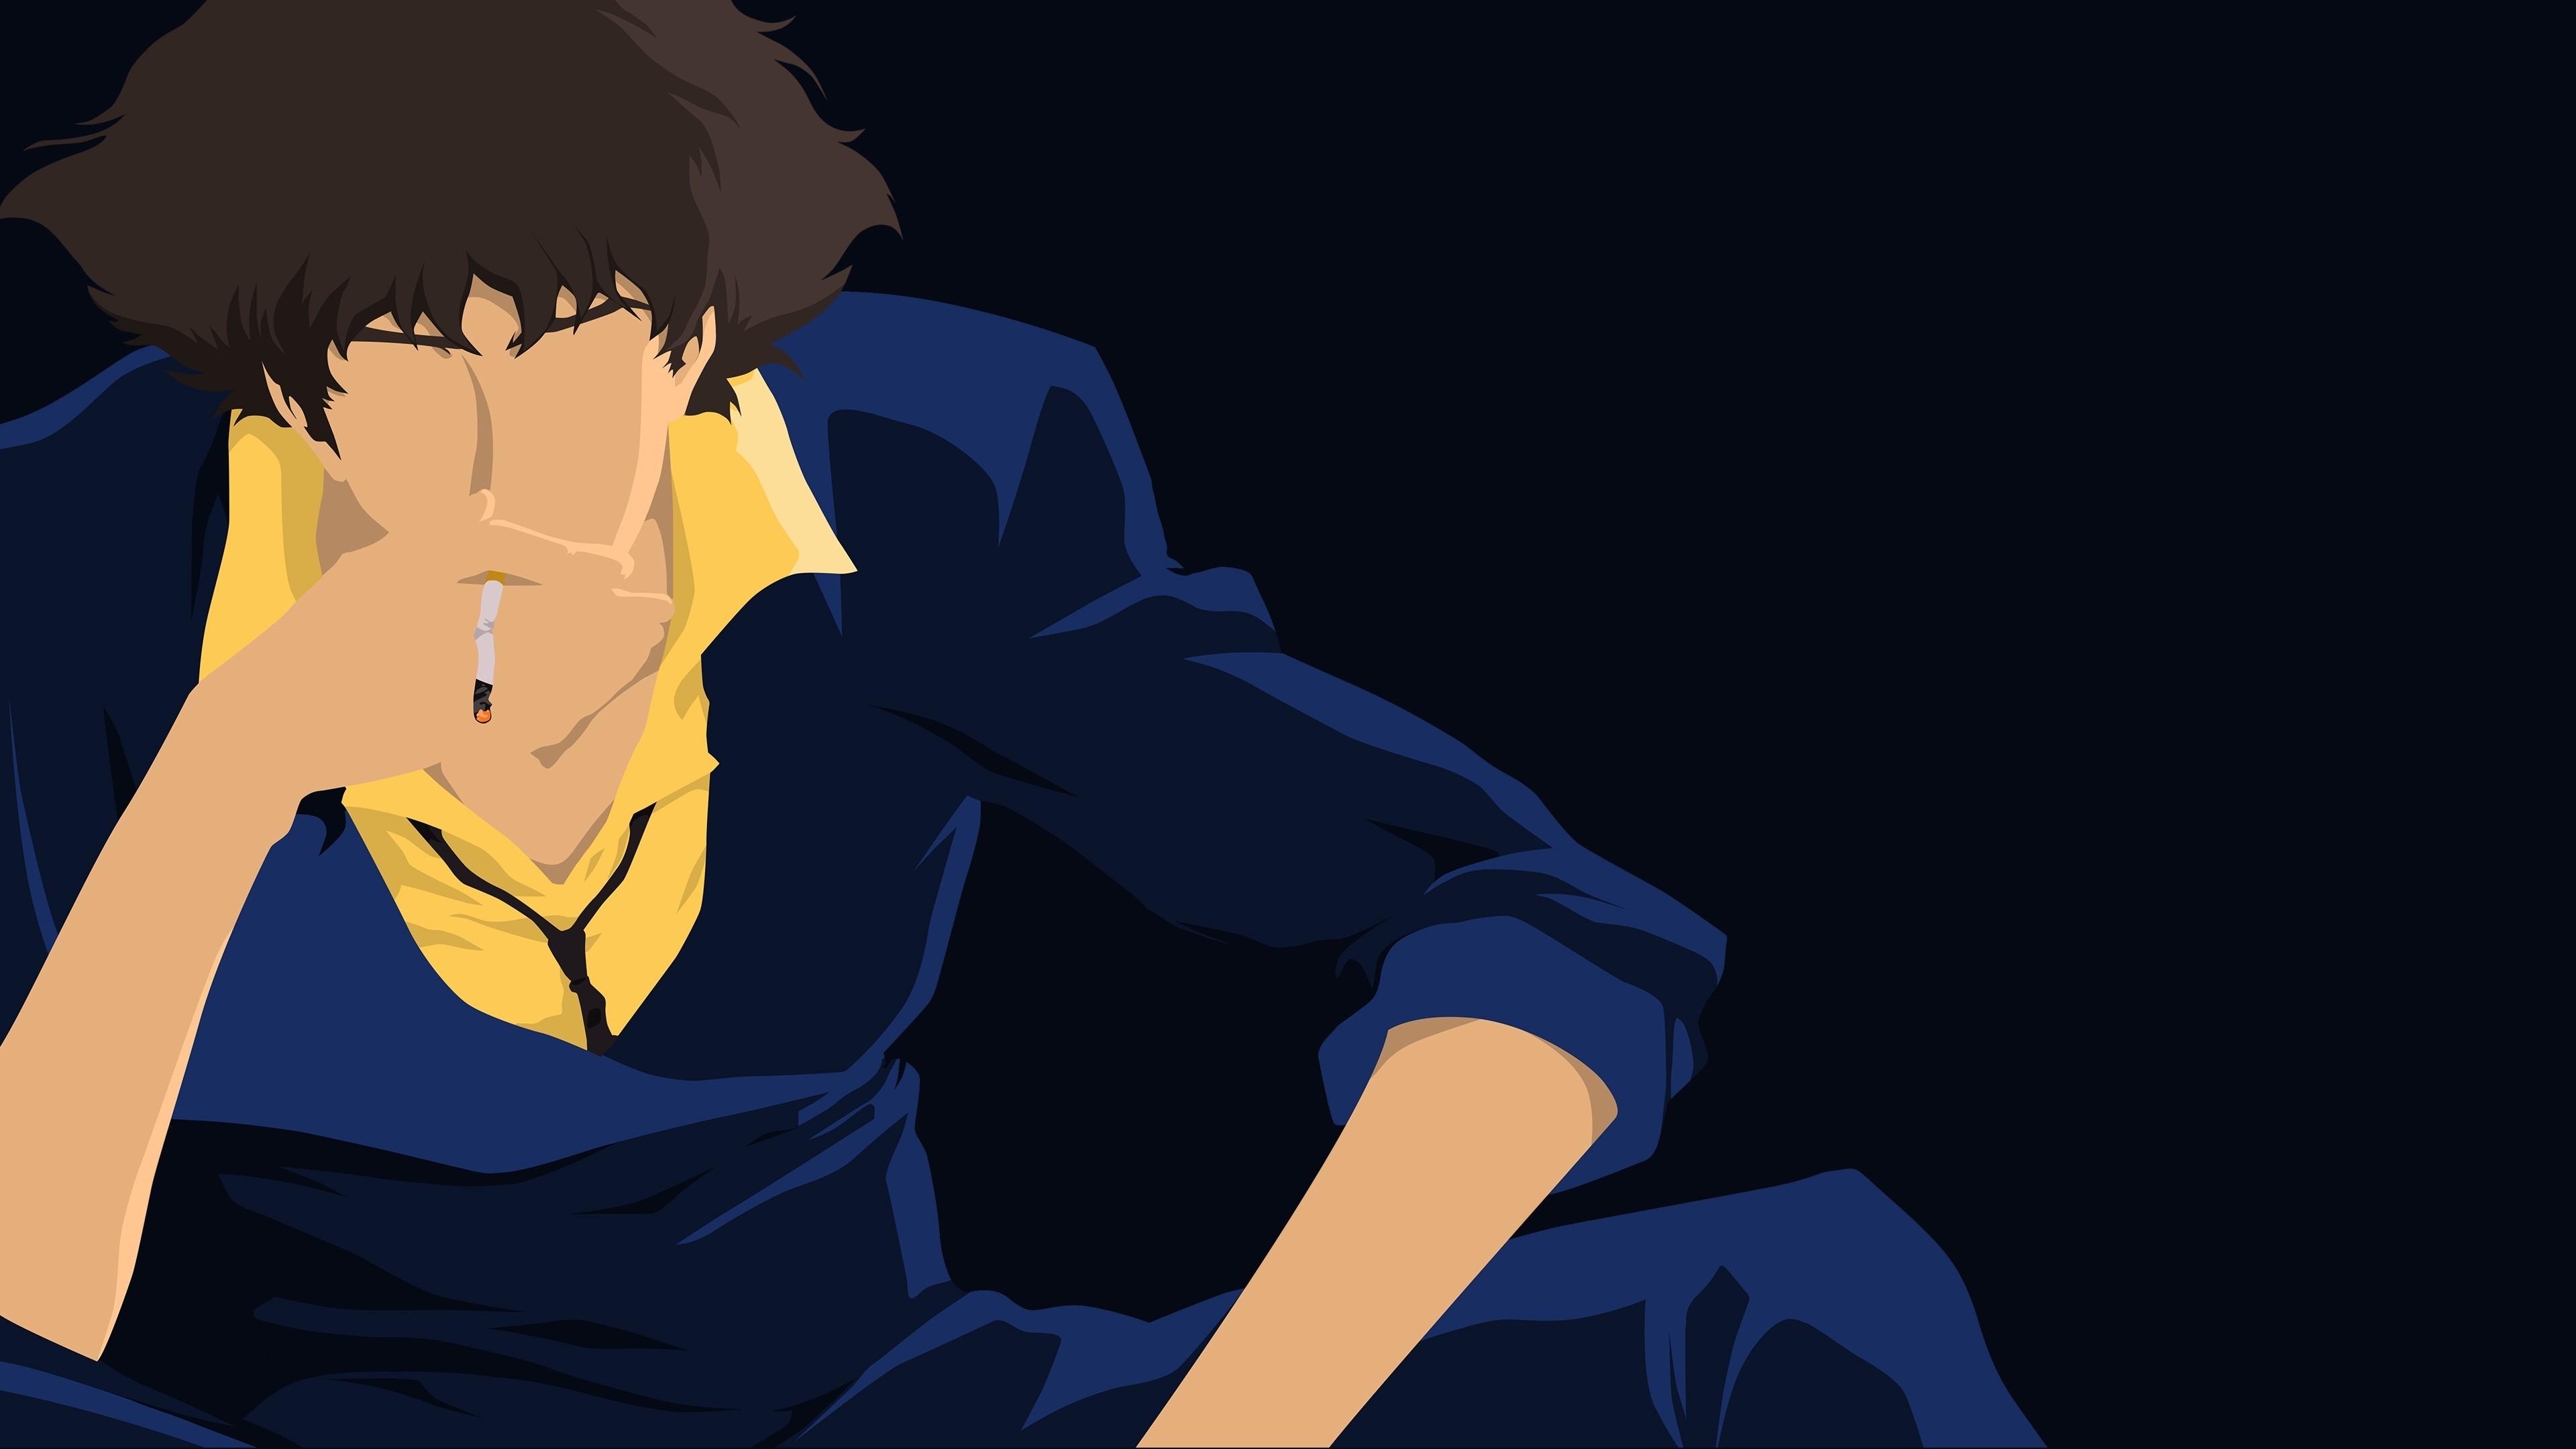 Cowboy Bebop, Spike Spiegel, Smoking, Anime Vectors Wallpapers HD / Desktop  and Mobile Backgrounds